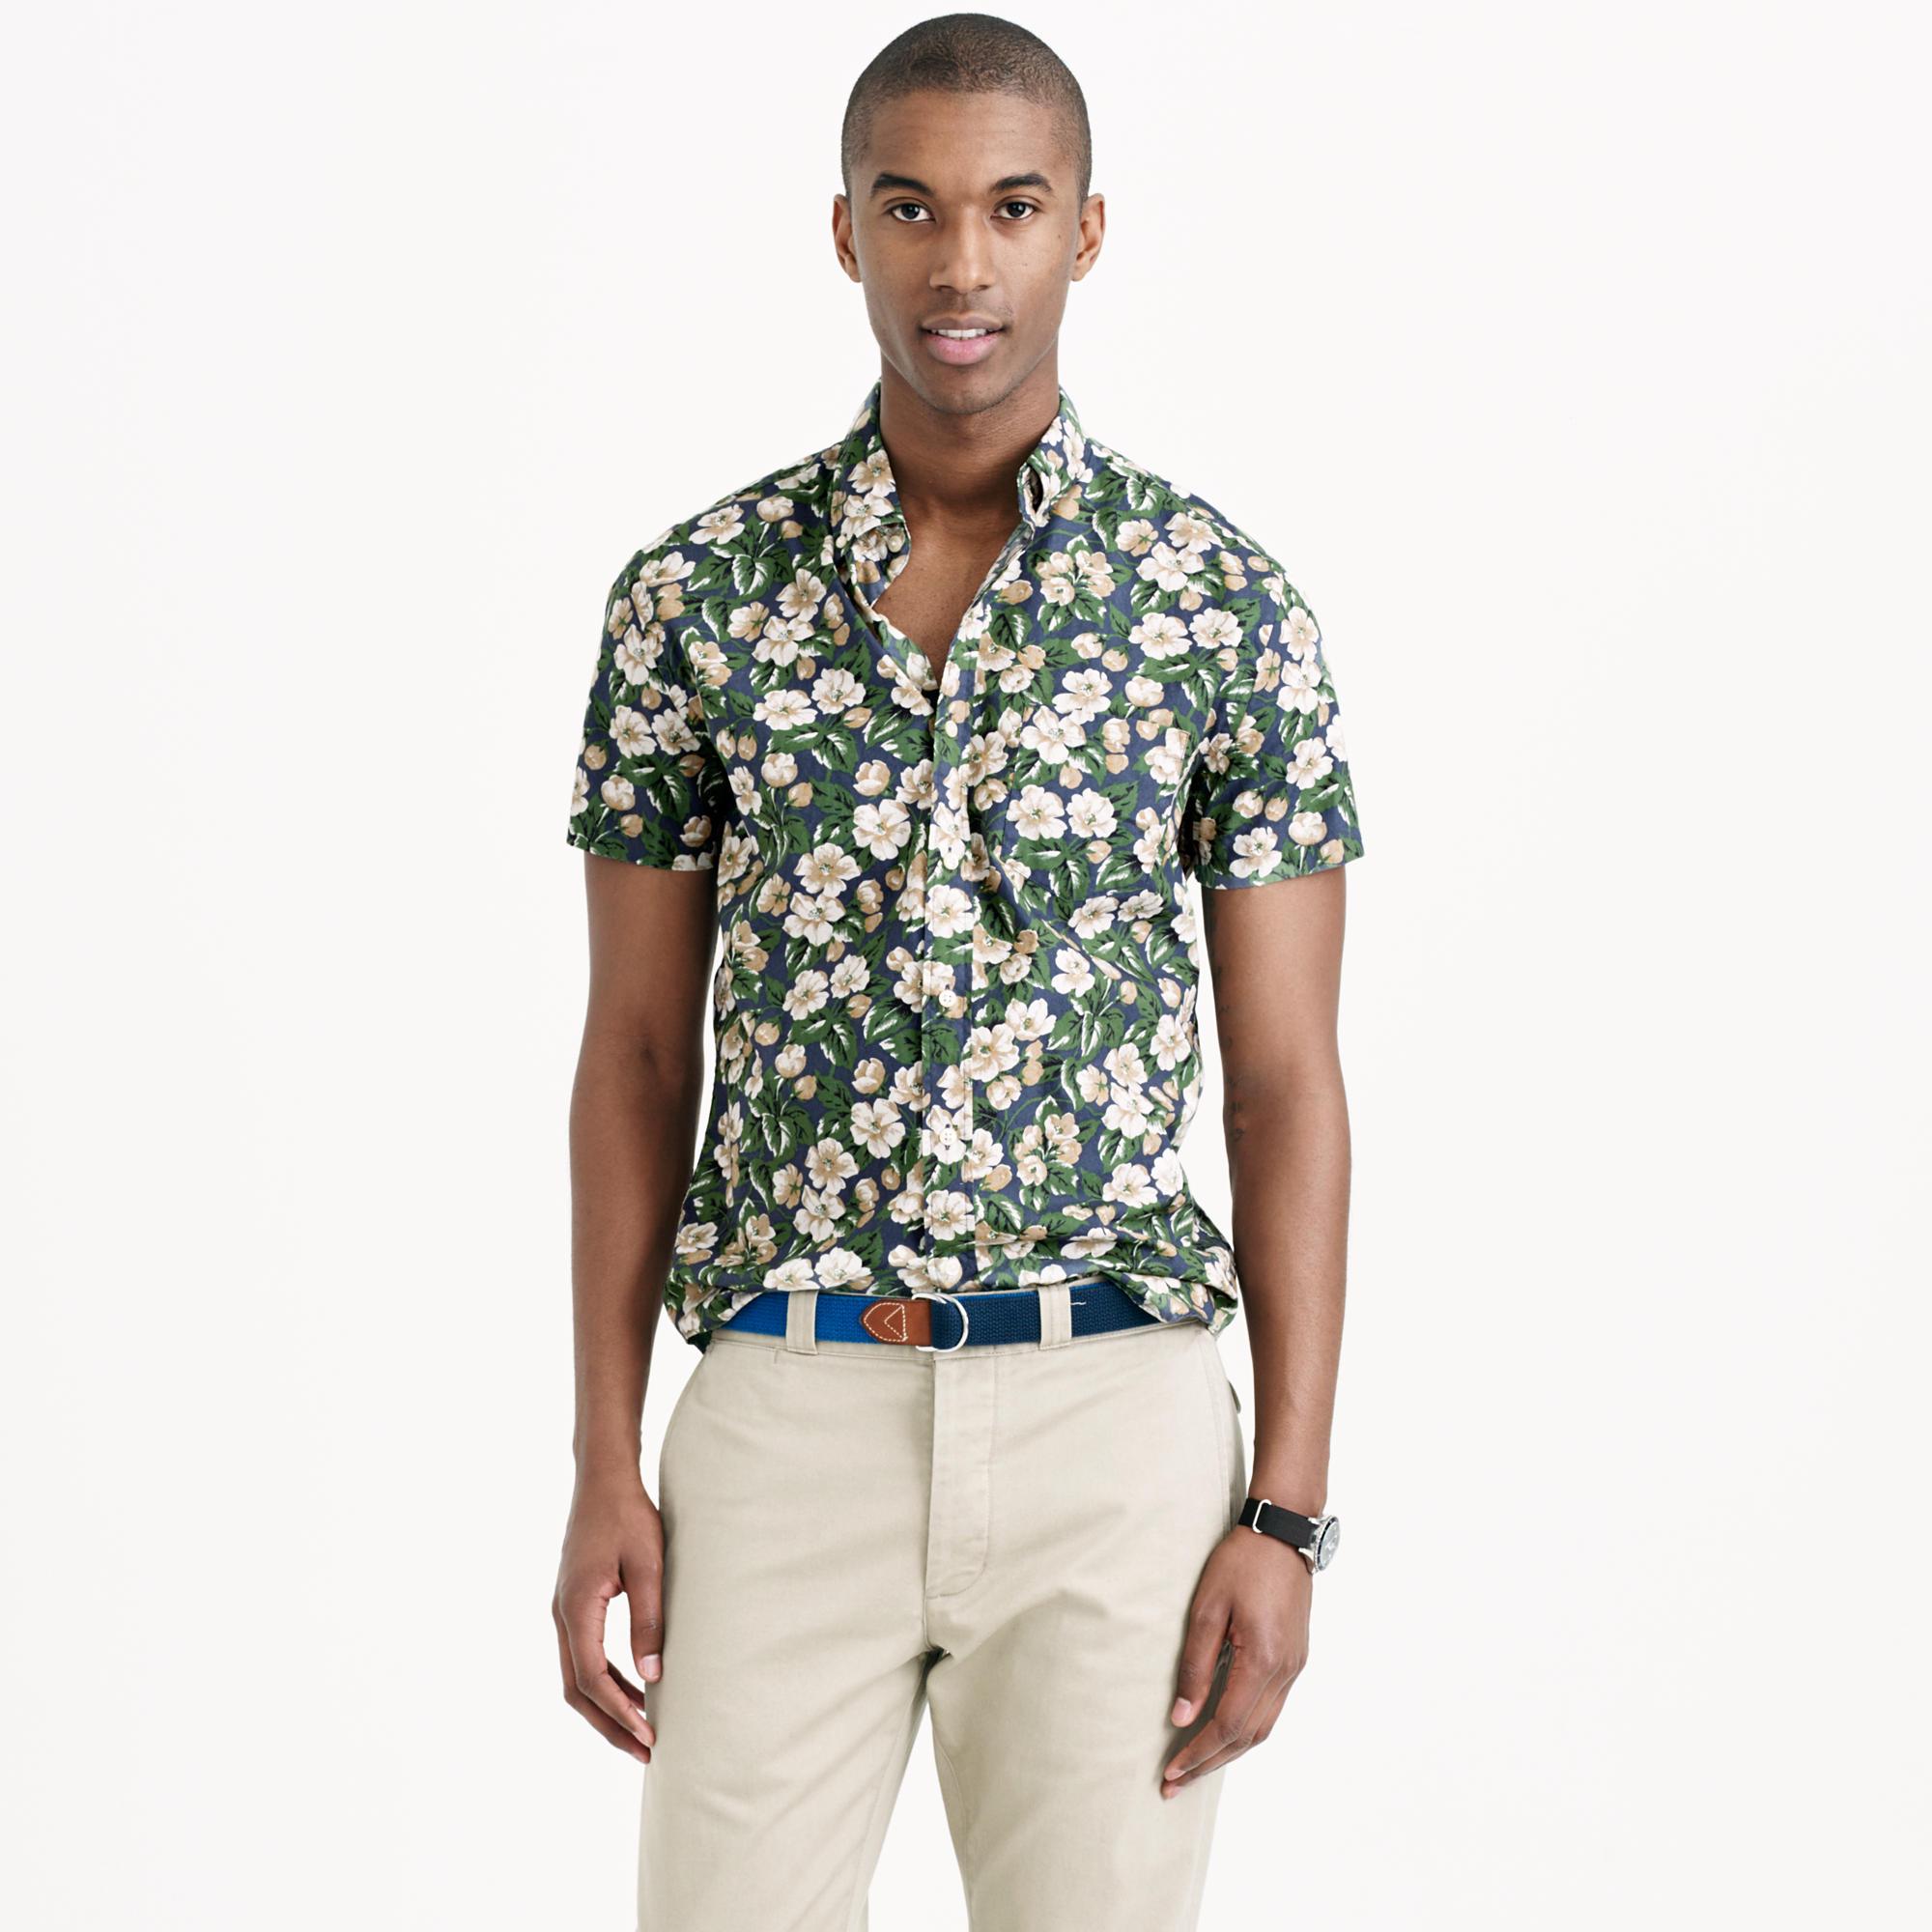 J.Crew Secret Wash Short-Sleeve Shirt in Faded Indigo Floral   Men's Prints